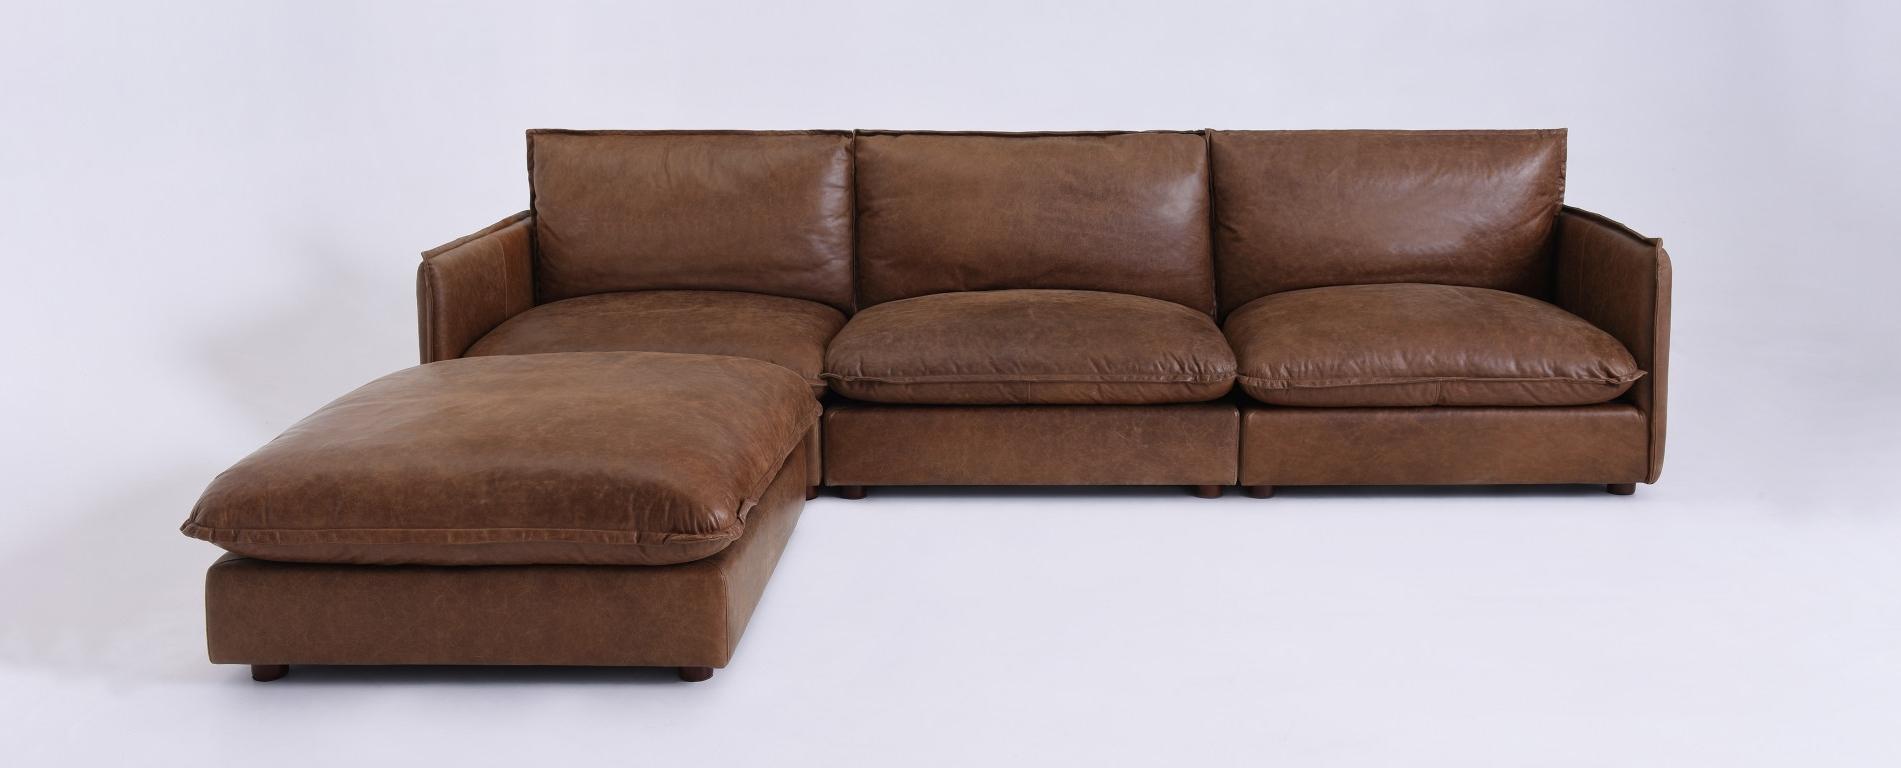 Most Popular Neva Modular Leather Chaise Sectional In Leather Chaise Sectionals (View 7 of 15)